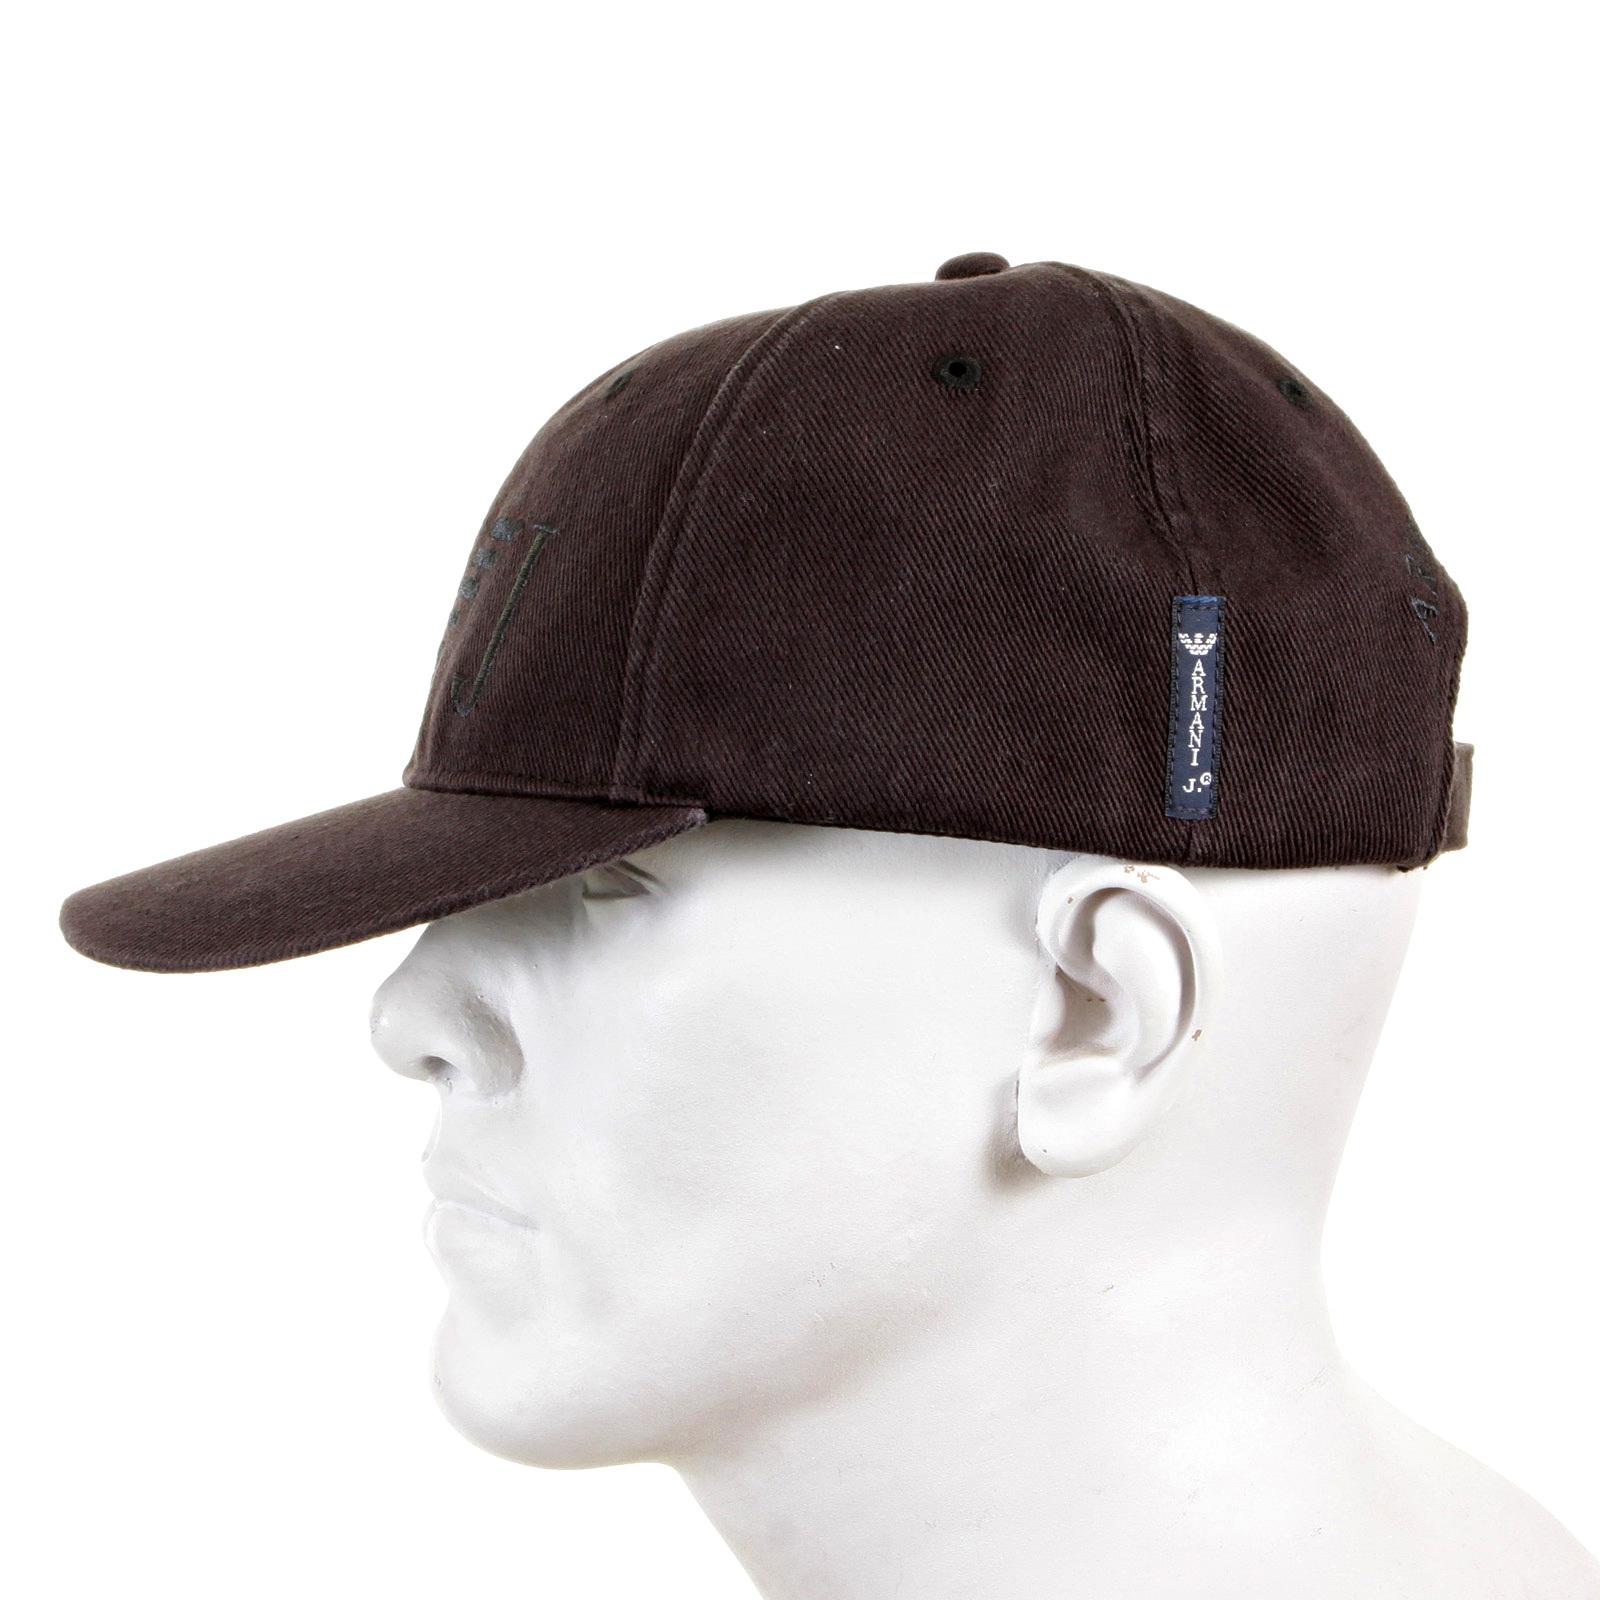 9e600be63d3255 Armani Jeans navy baseball cap 06481 XE AJM2267 at Togged Clothing